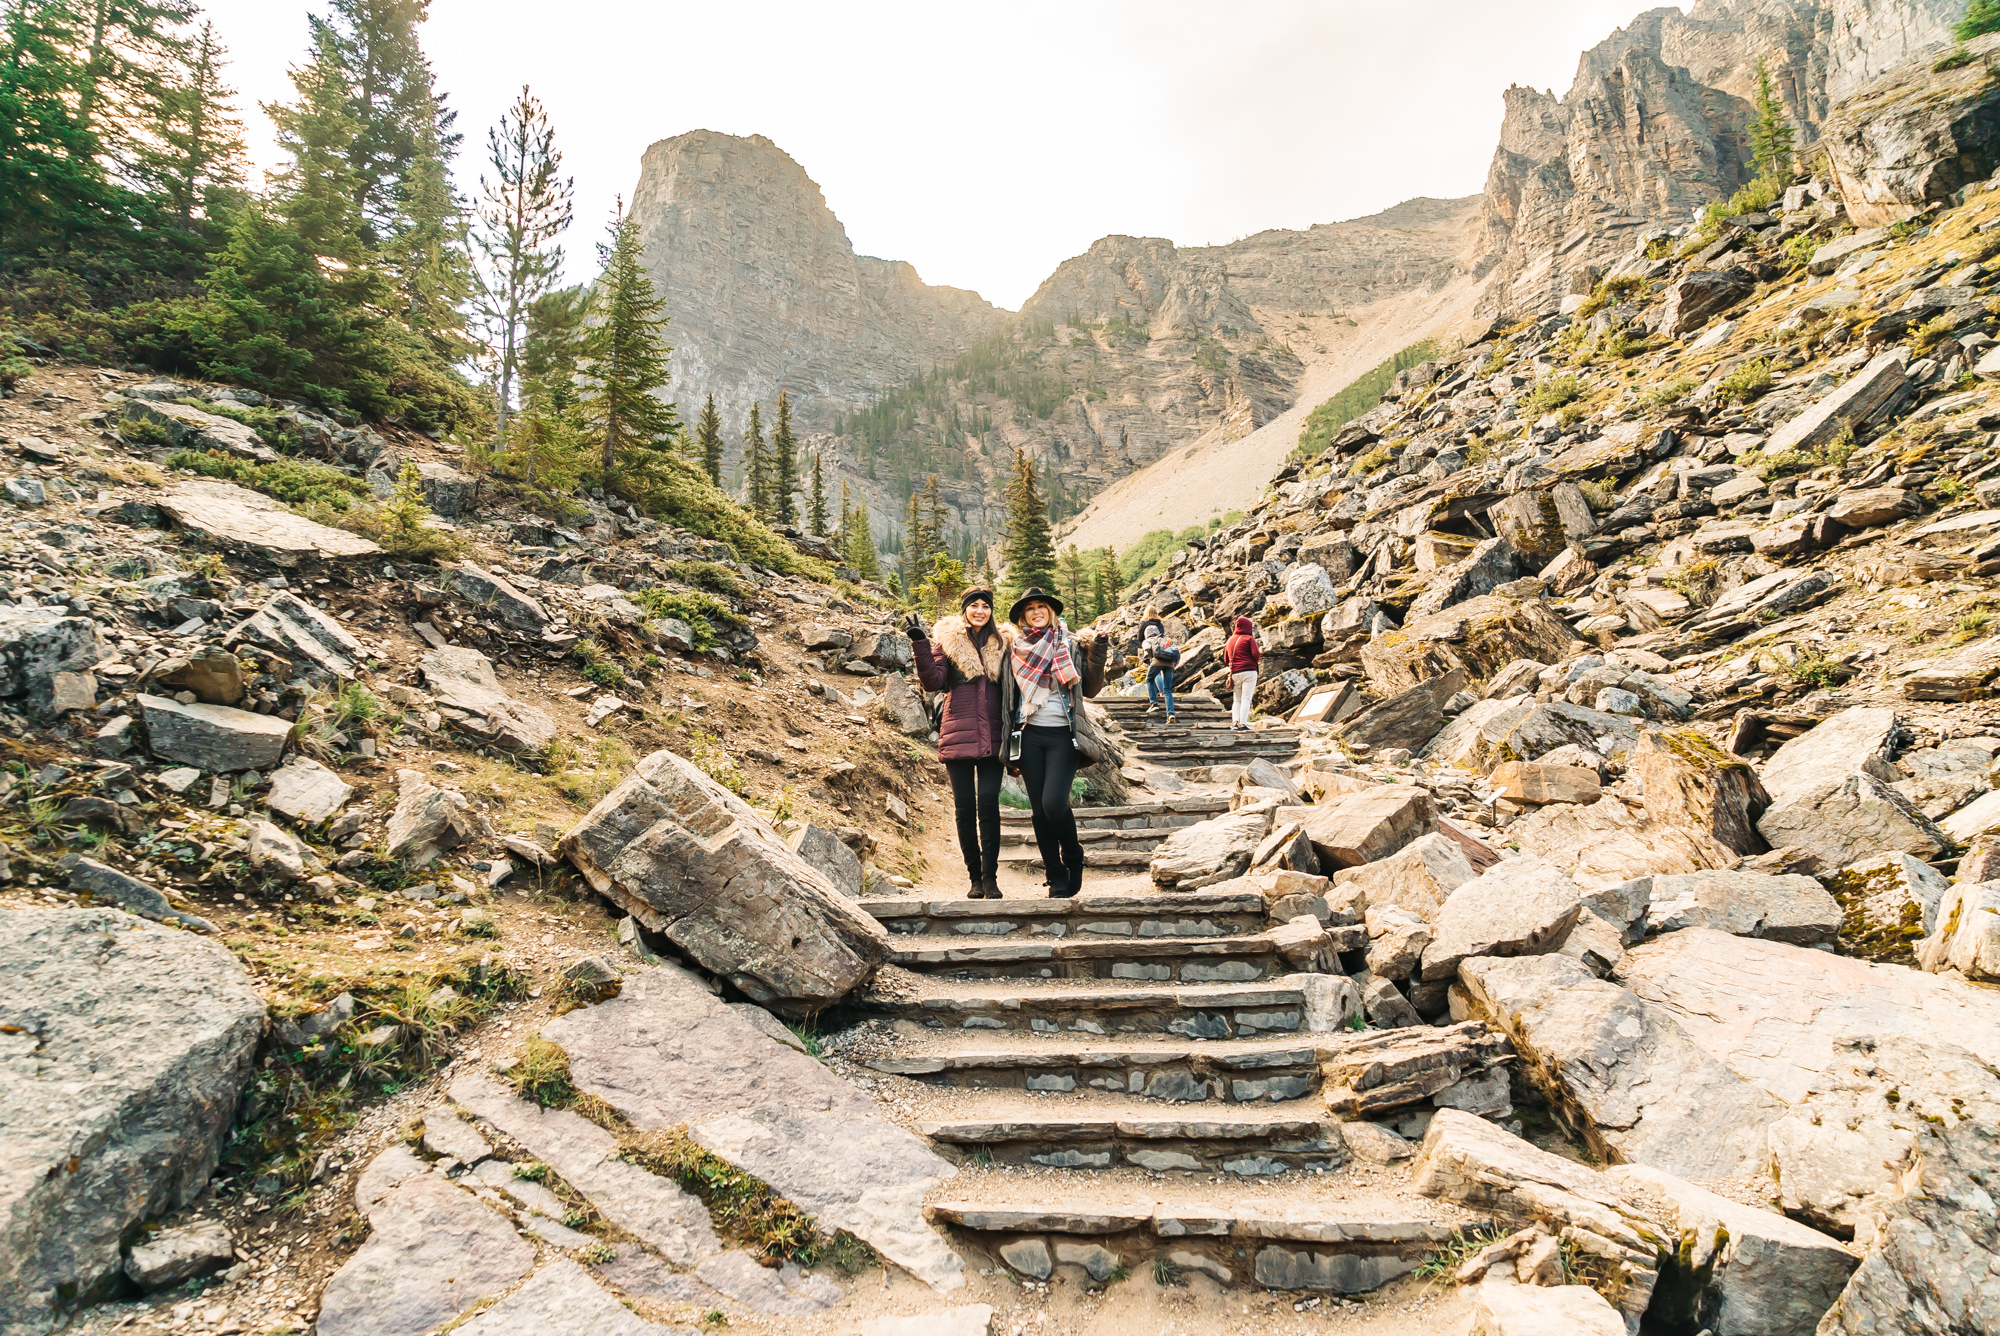 Moraine+Lake+#Banff+#Canada+#nationalpark